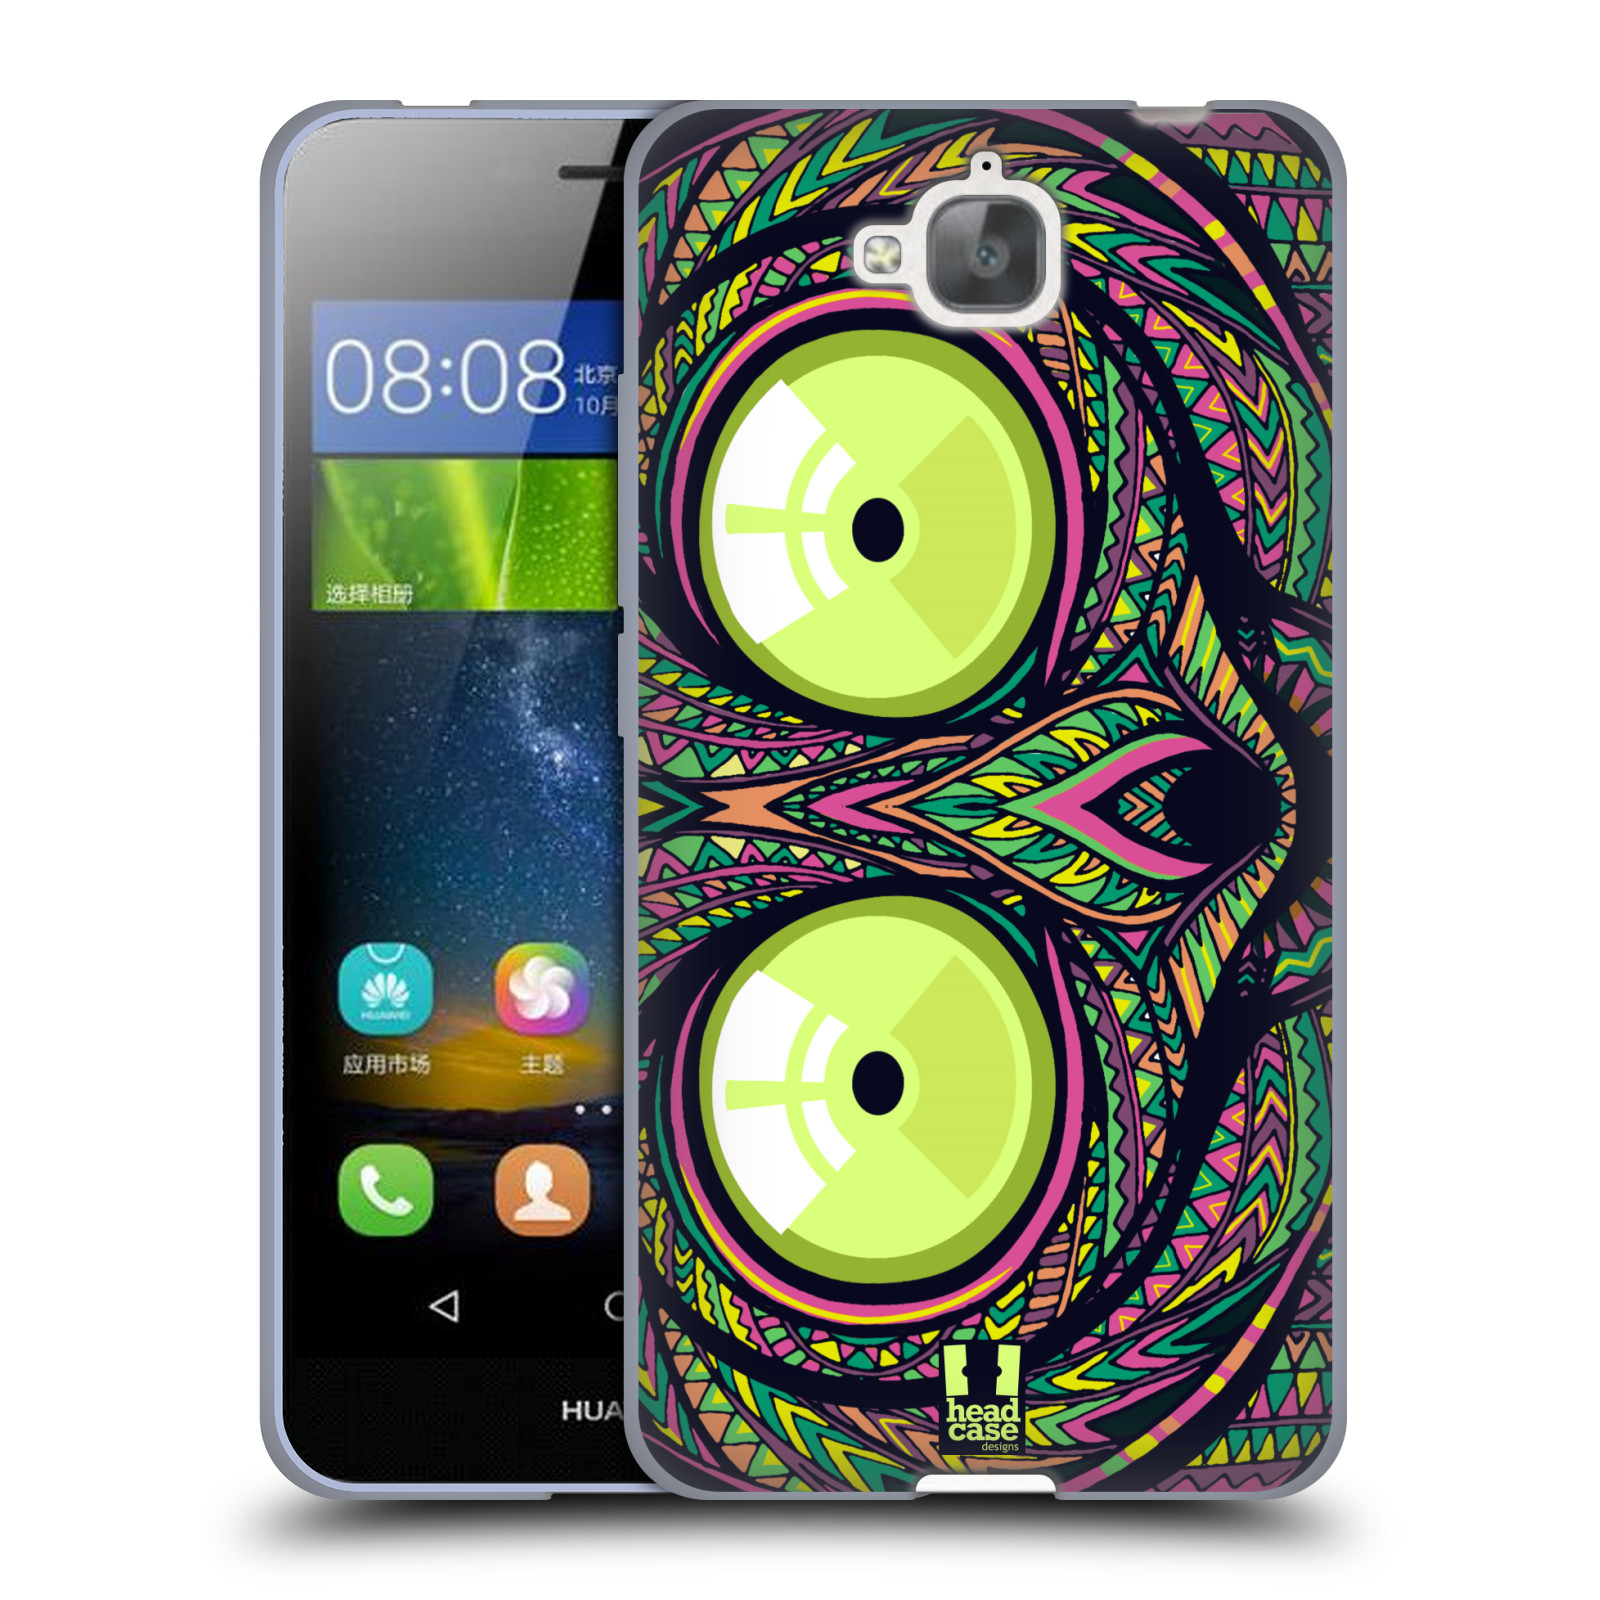 Silikonové pouzdro na mobil Huawei Y6 Pro Dual Sim HEAD CASE AZTEC NÁRTOUN